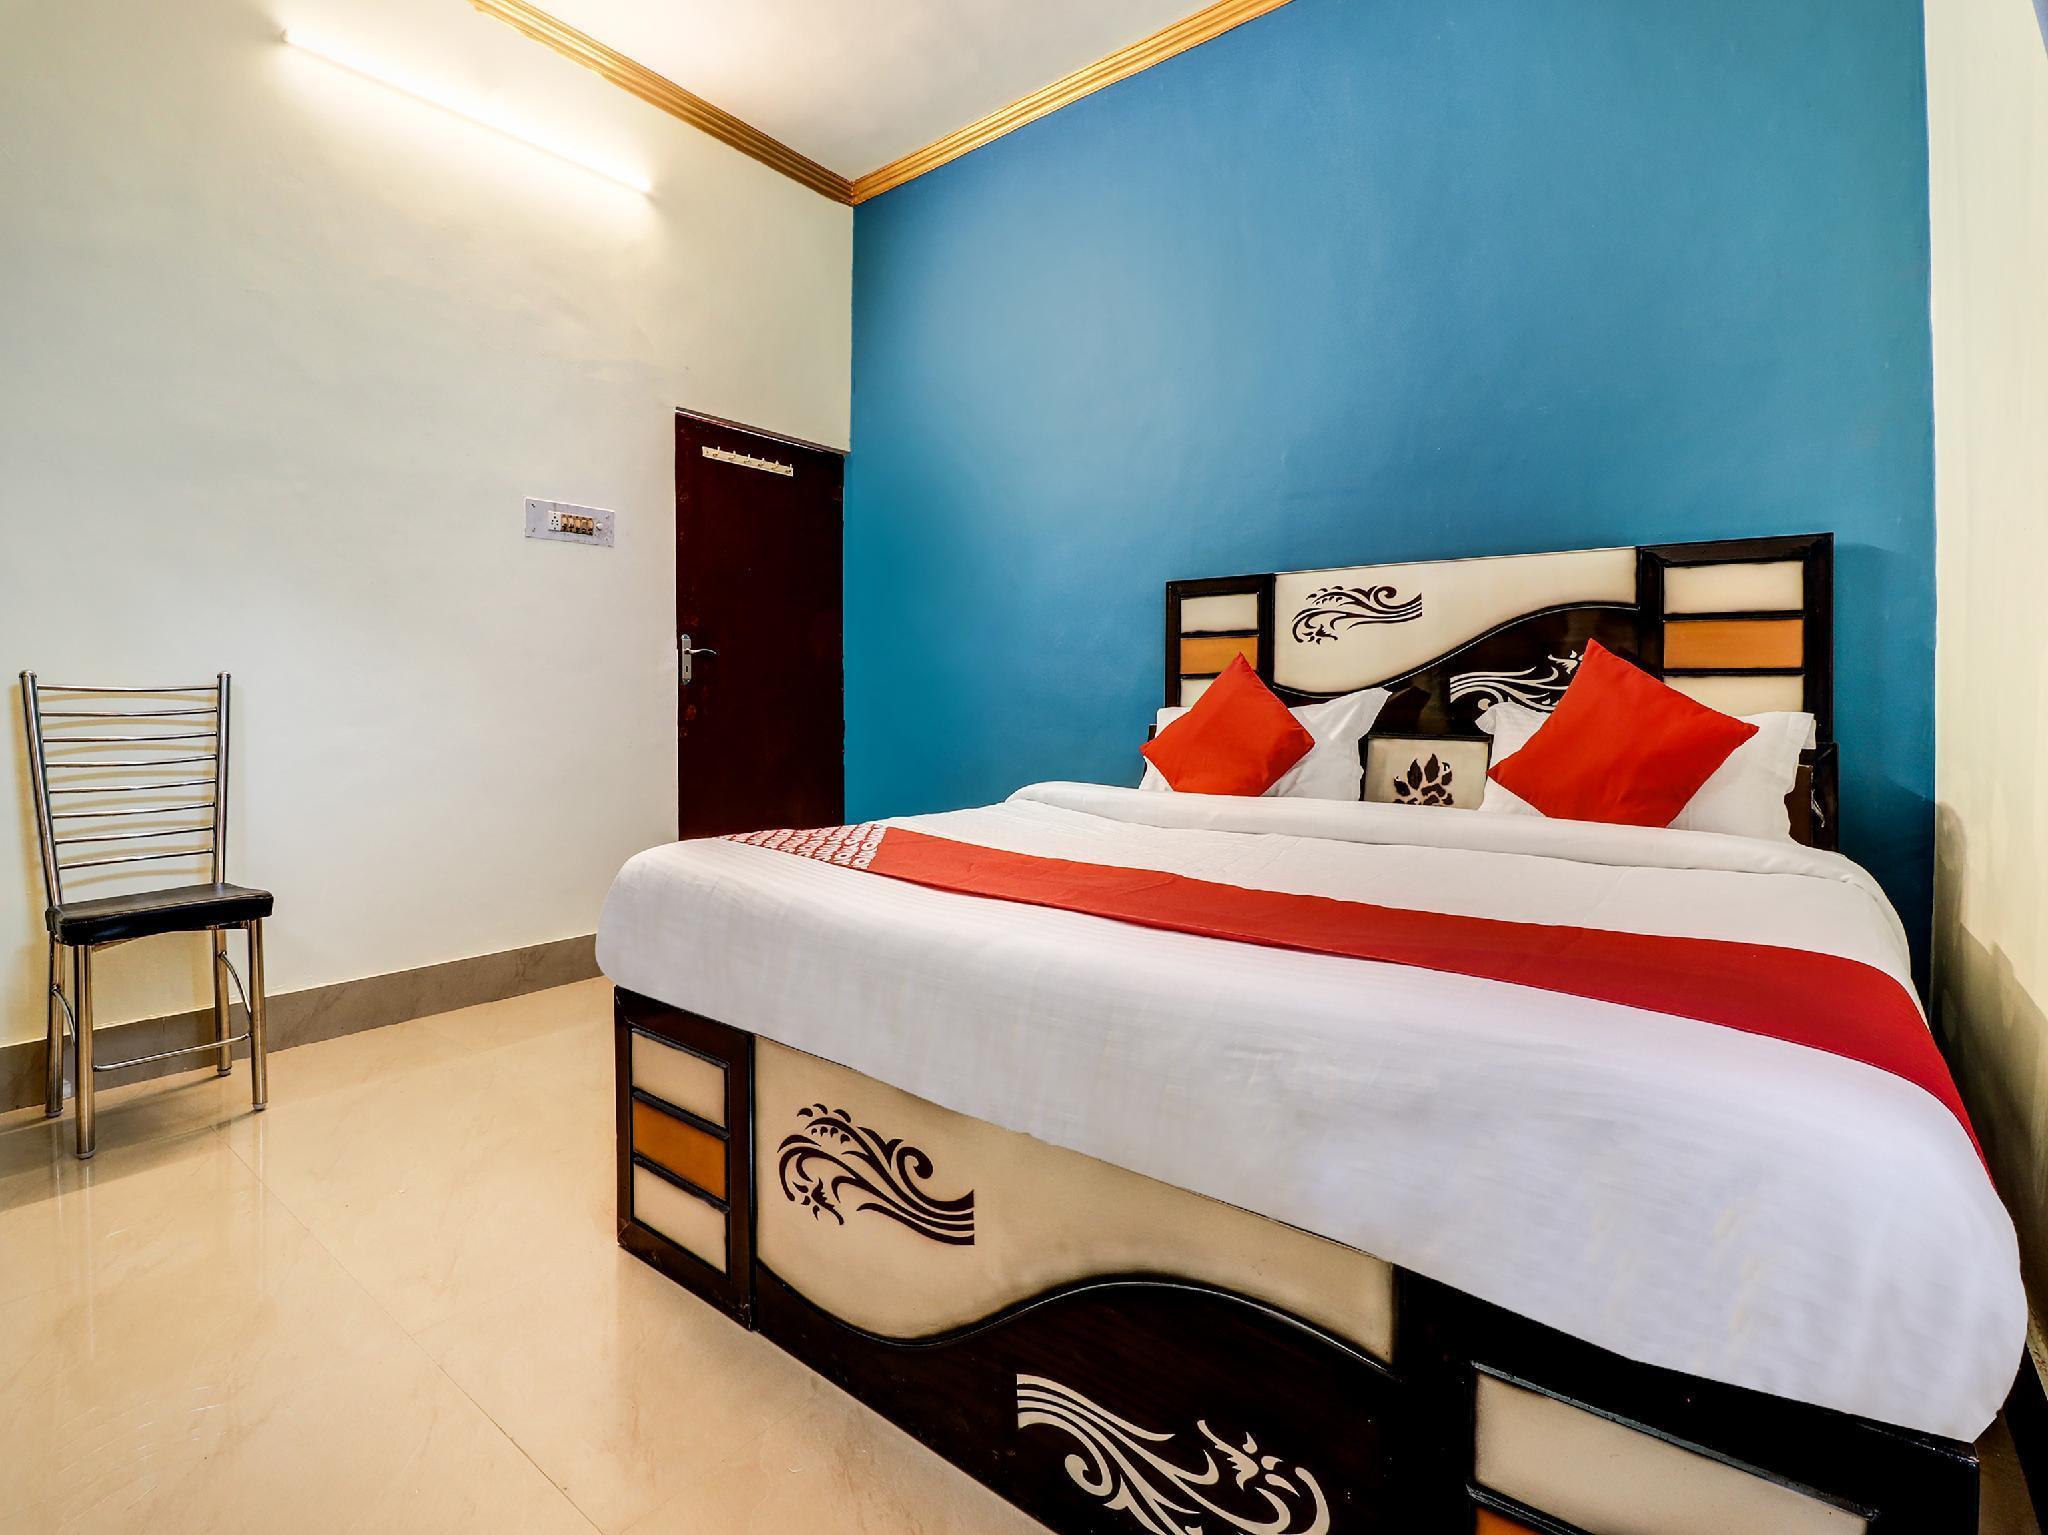 OYO 39478 Star City Hotel